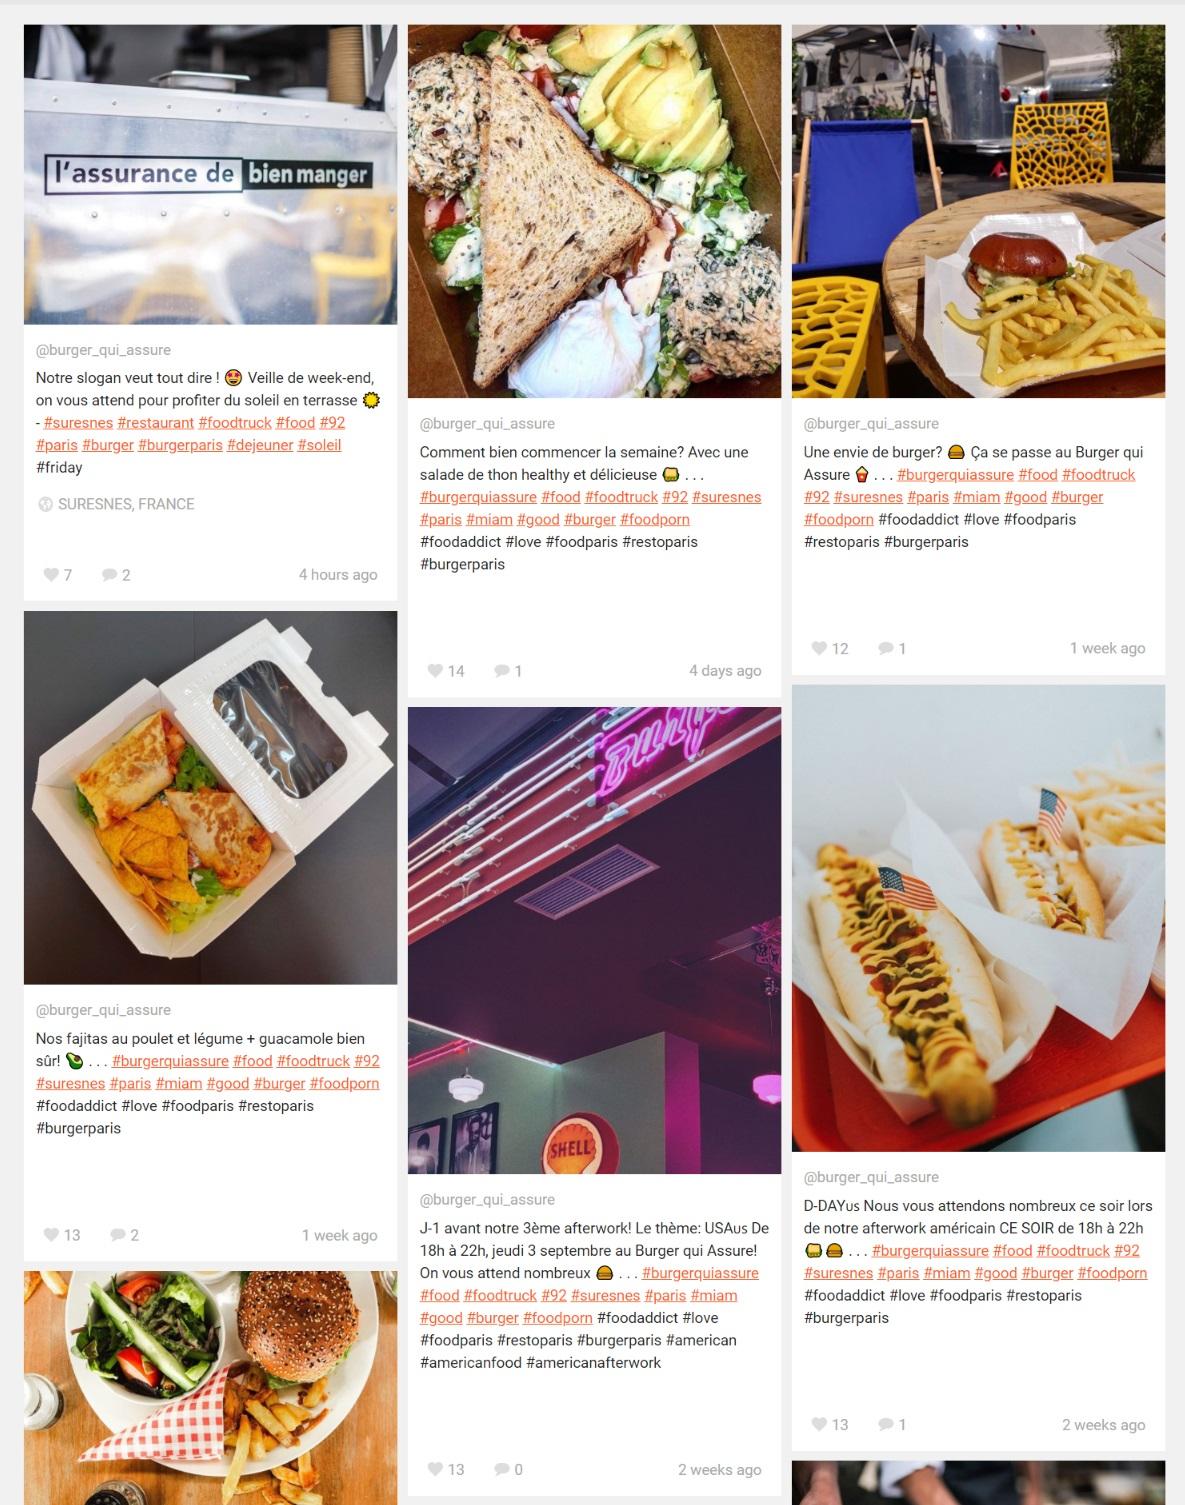 foodtruck burger qui assure SPVIE Assurances